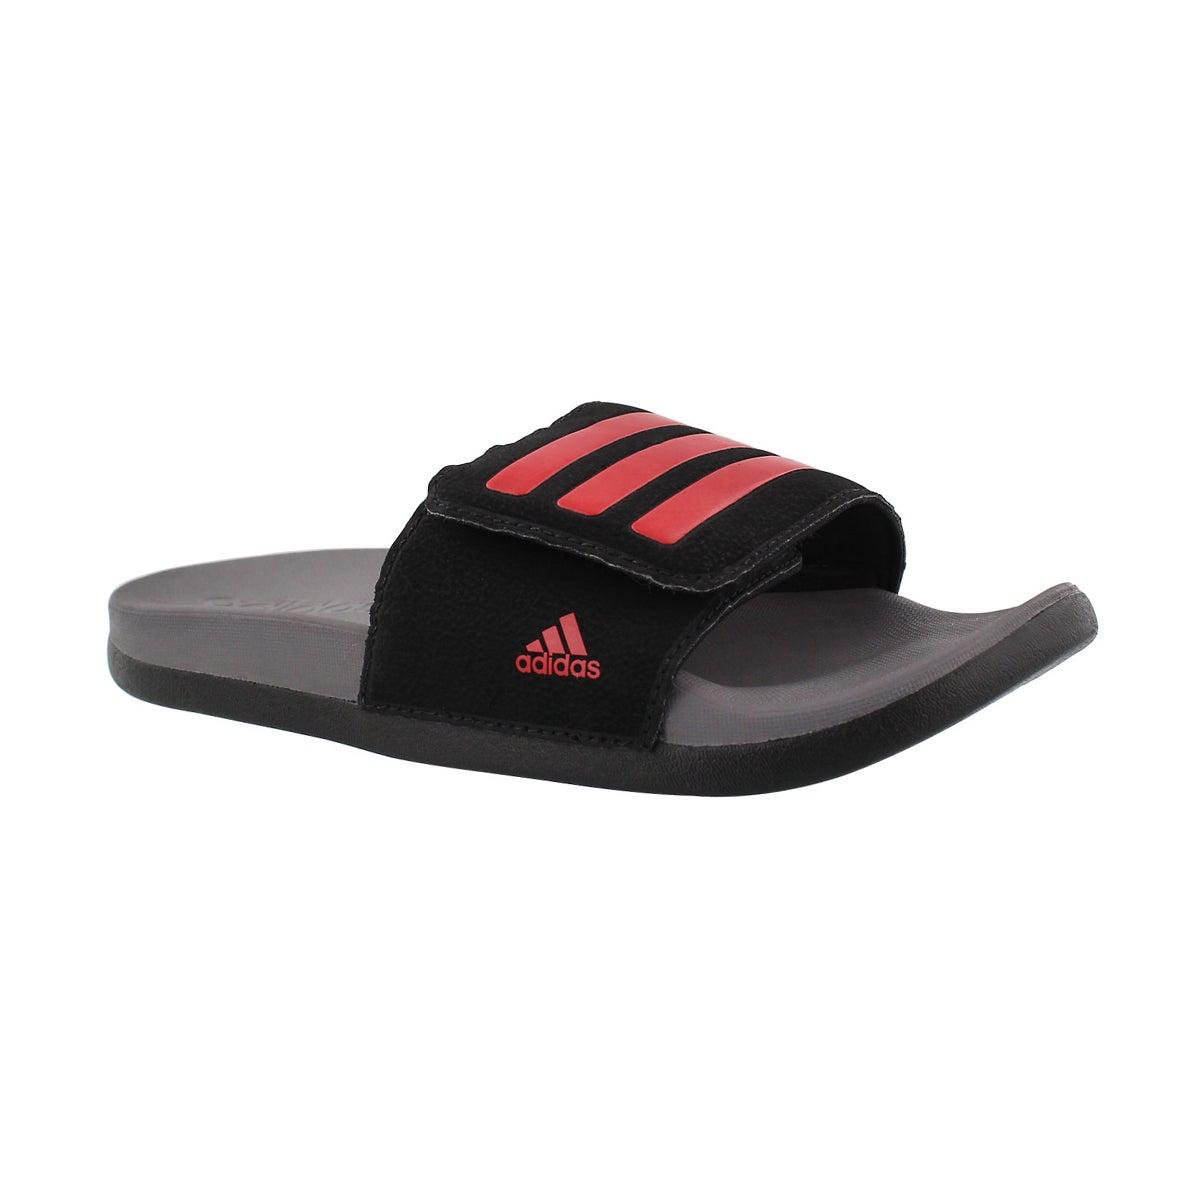 Kids' ADILETTE CLF black/red adjustable slides